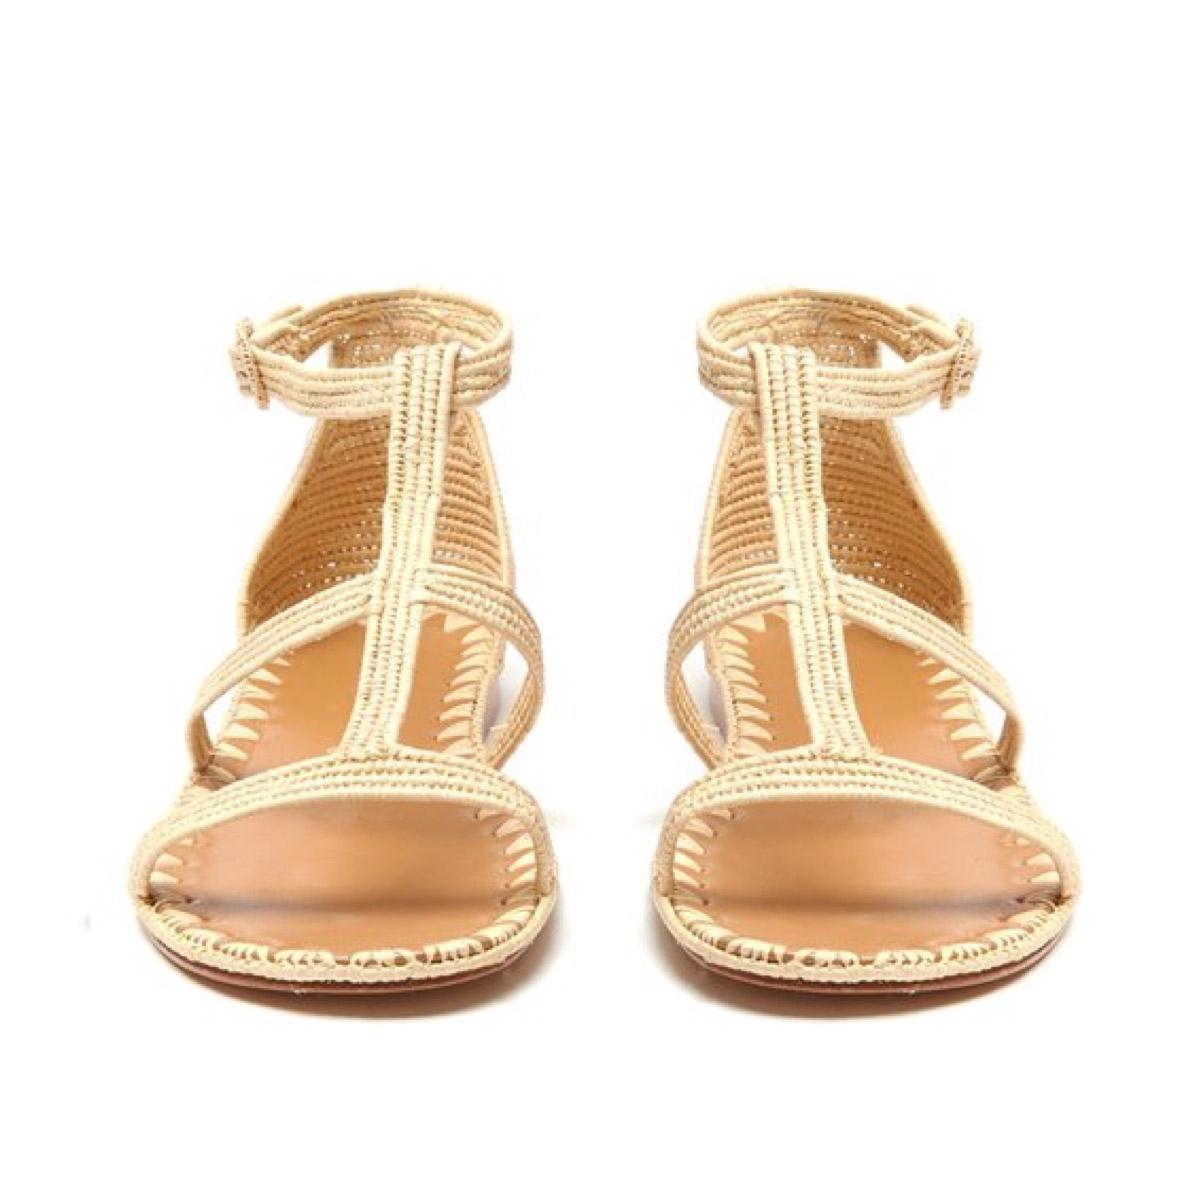 Faux Raffia Sandals